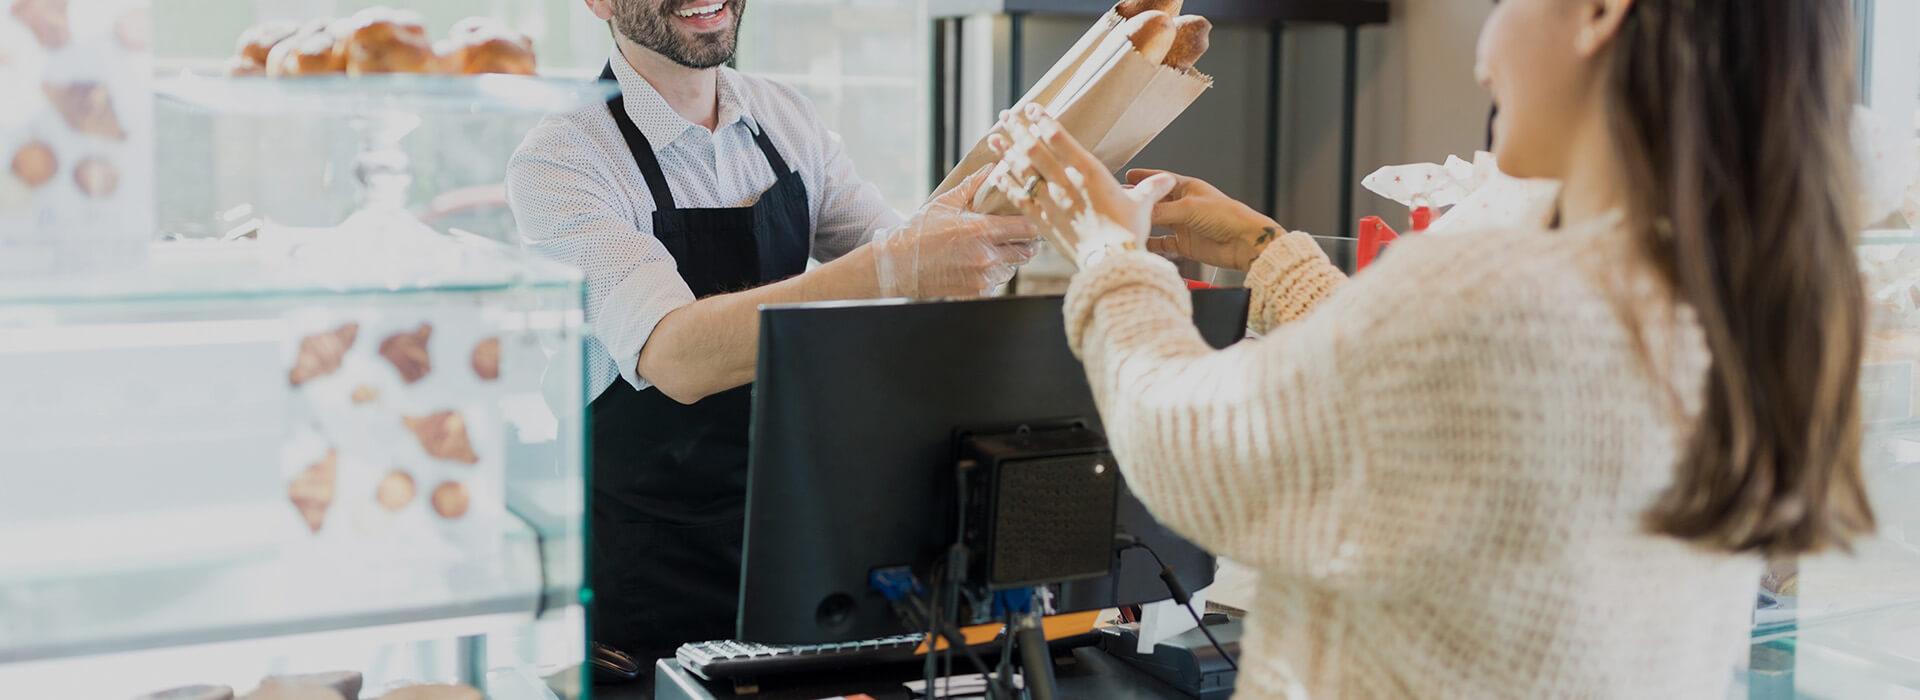 command-boulangerie-helin-commande-place-verte-soignies